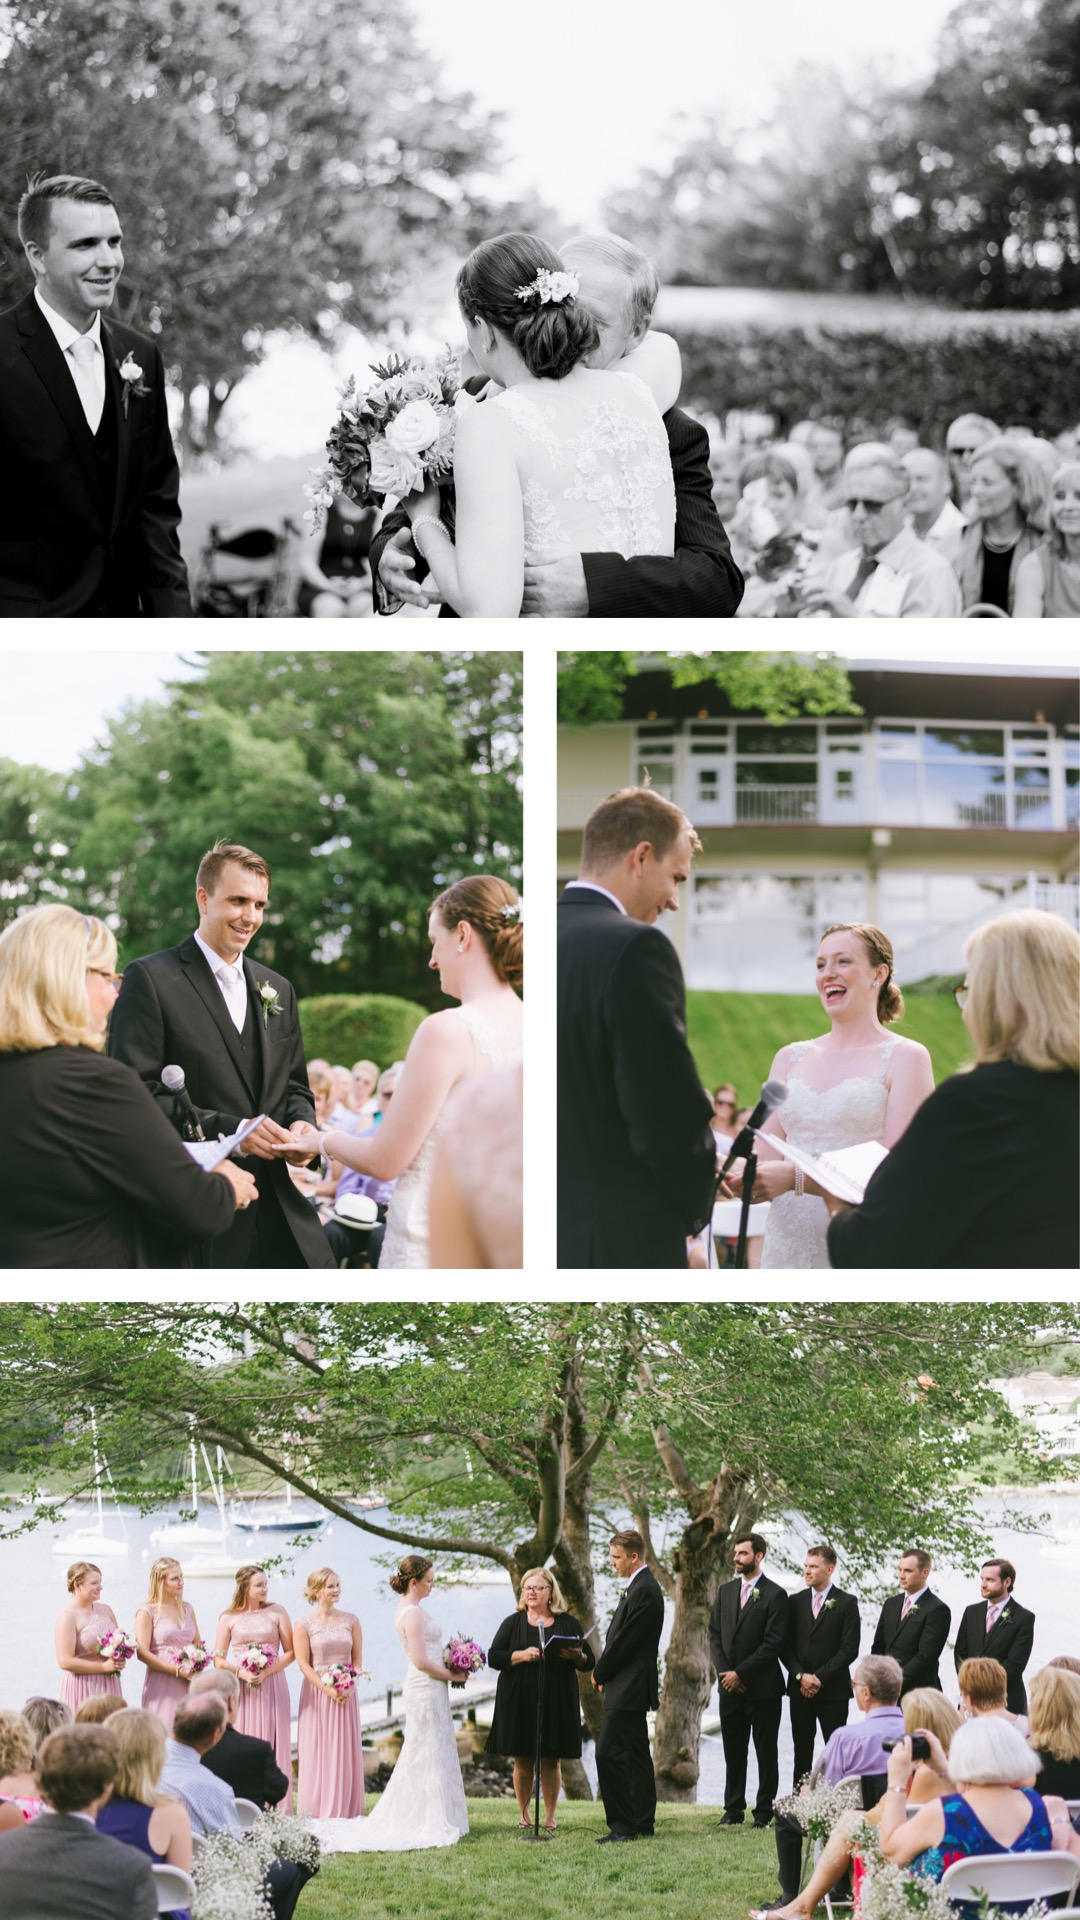 Martina & Scott Halifax Wedding Photographer - Sinead Dubeau Photography 13